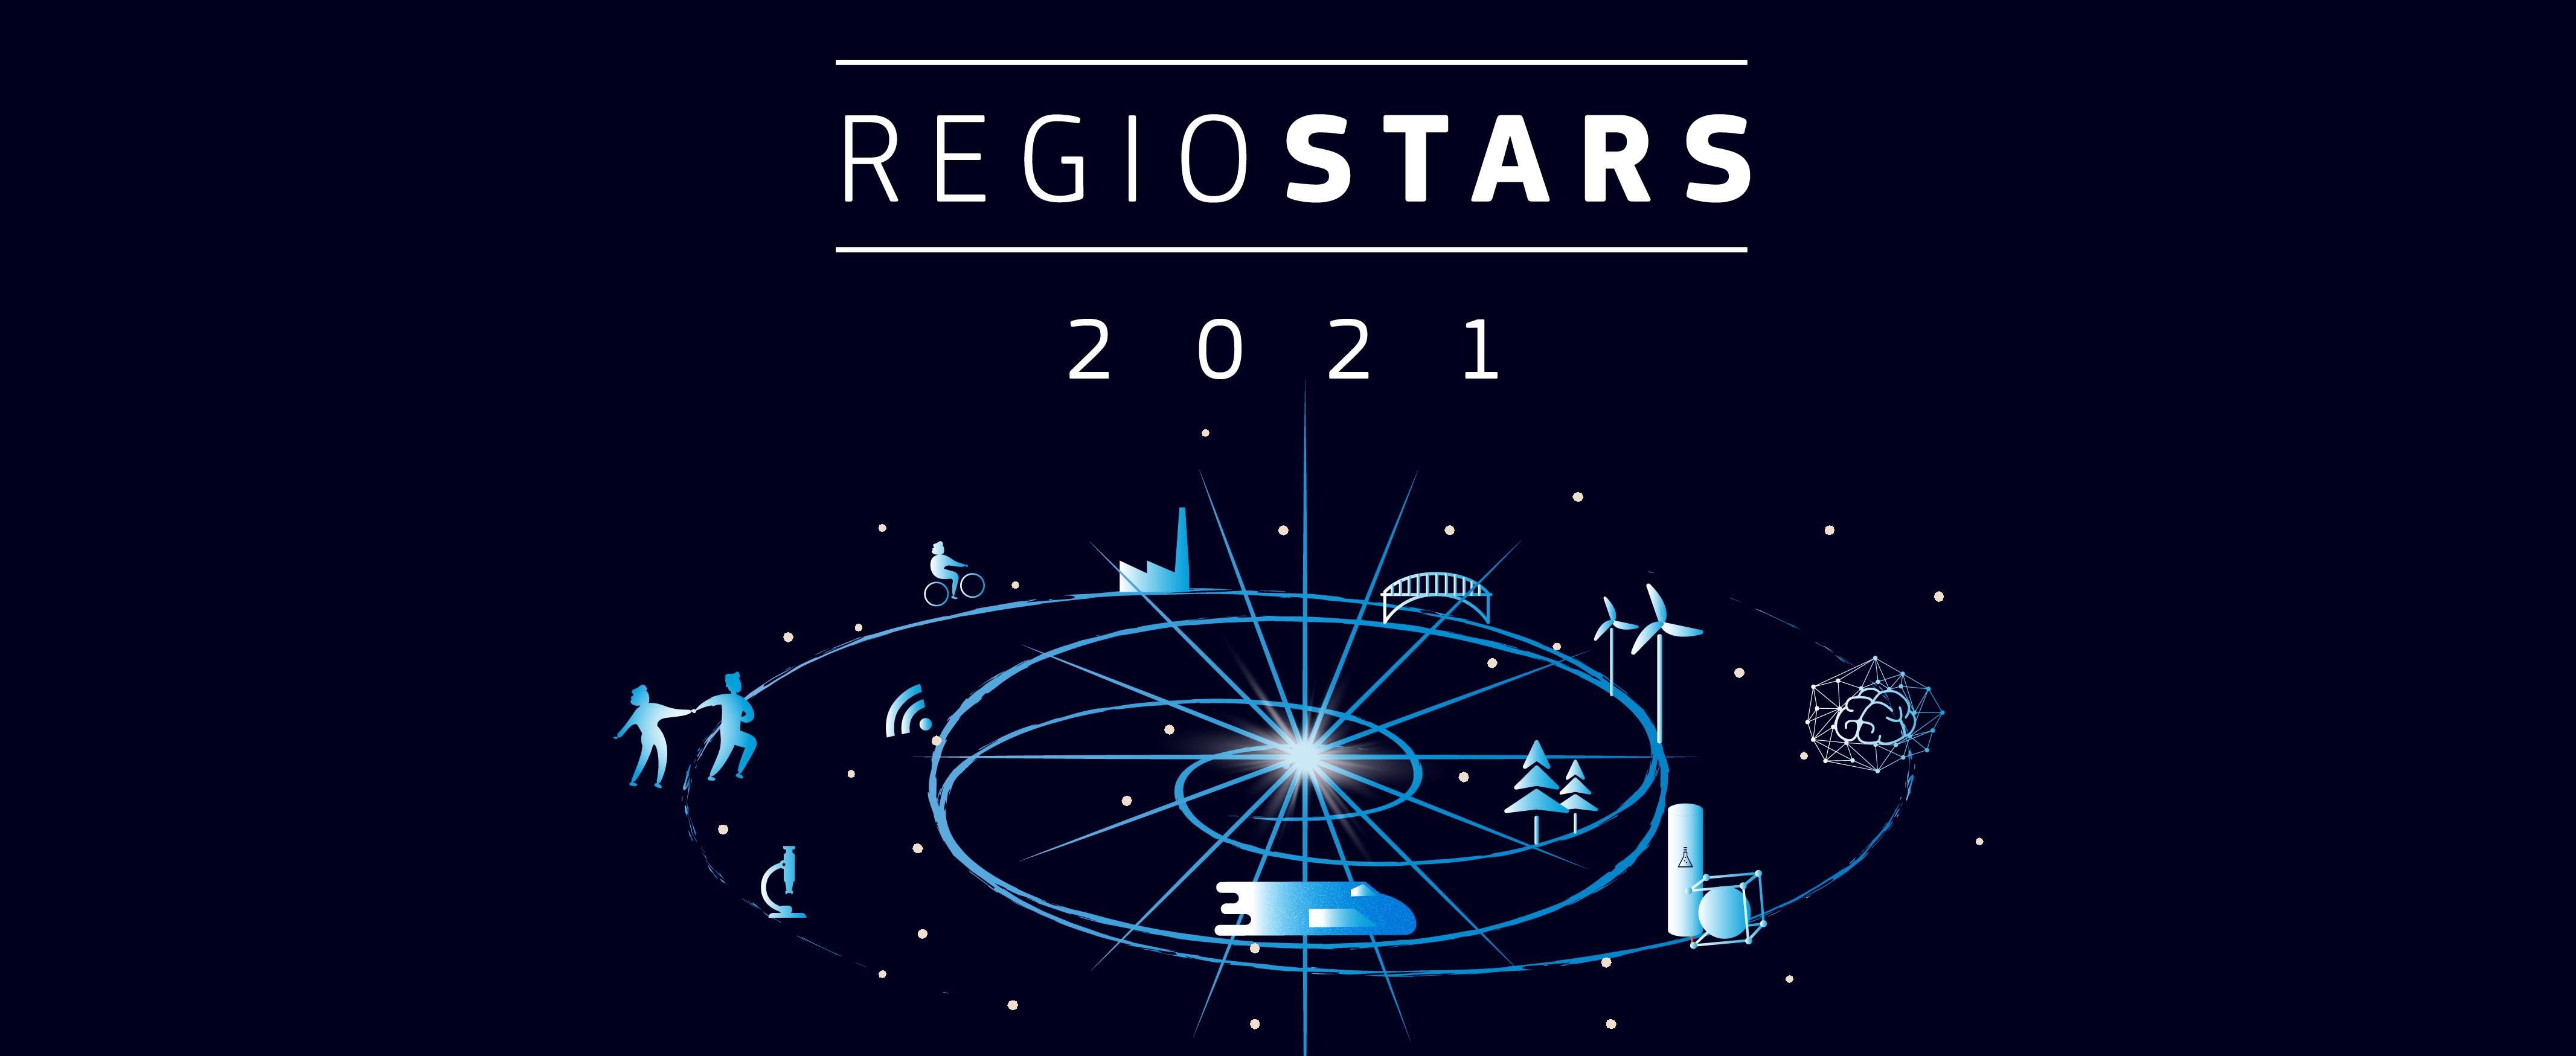 Lancement du concours Regiostars 2021